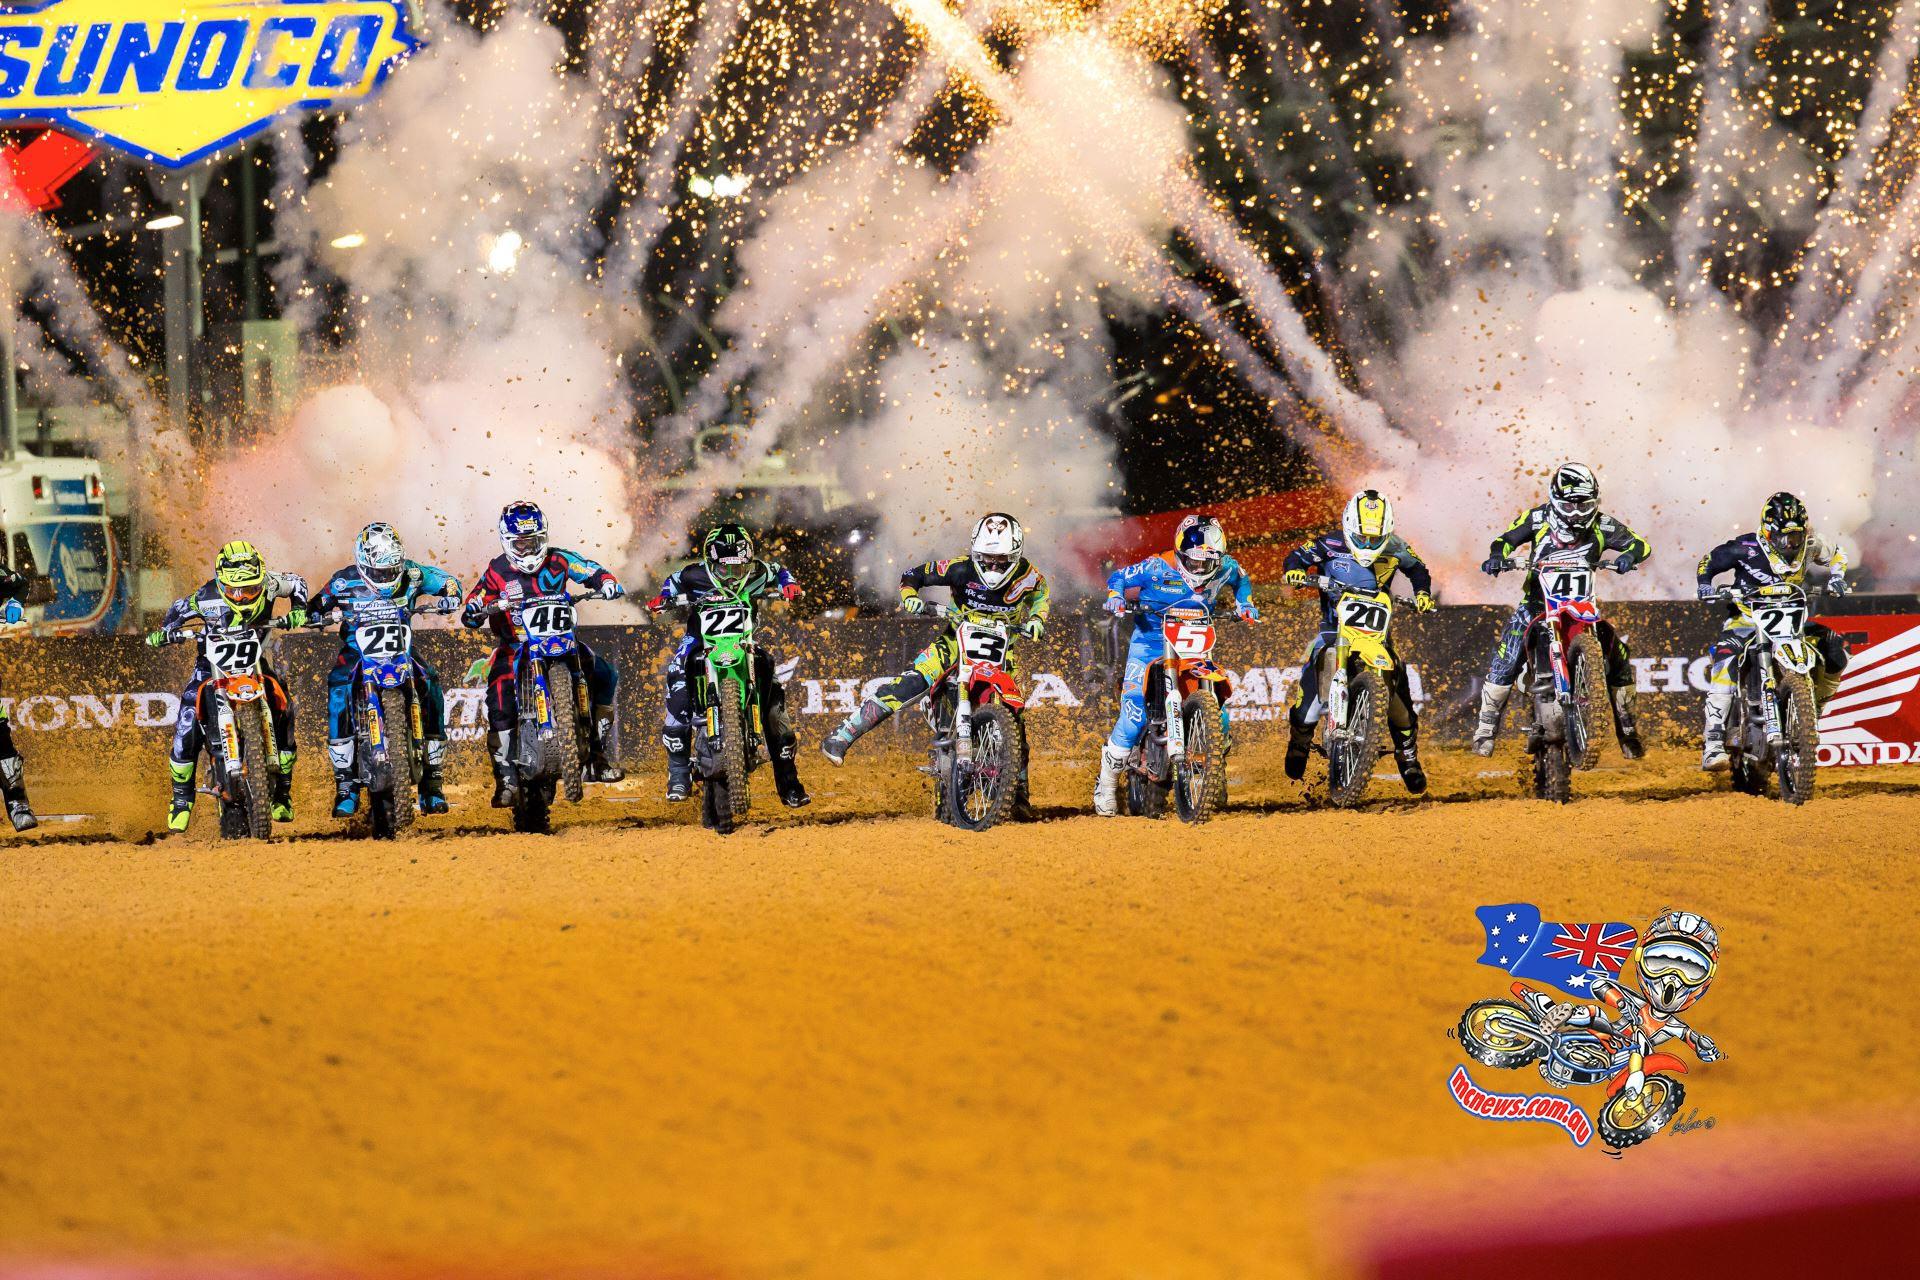 AMA Supercross 2015 Daytona